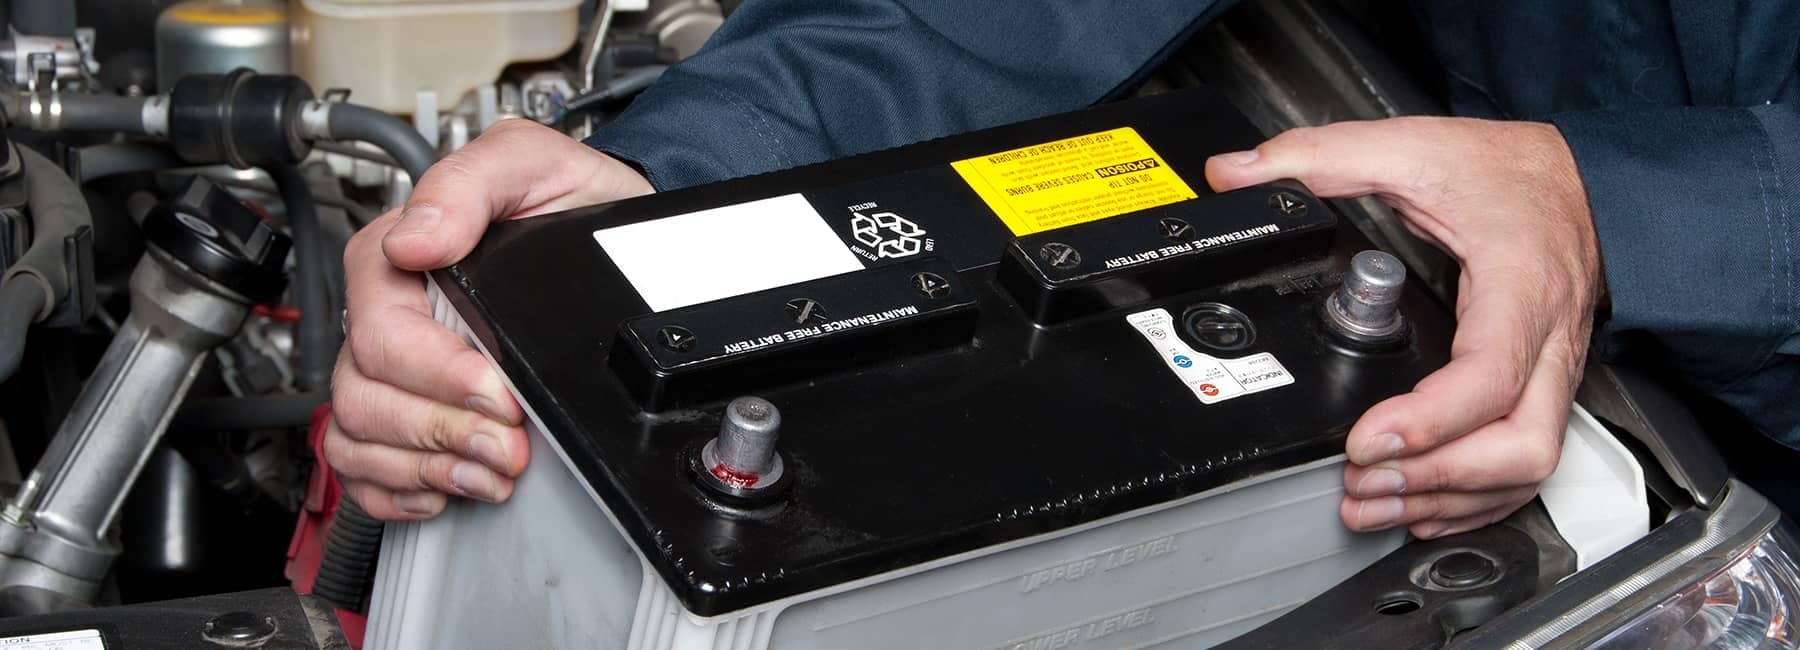 Mechanic installing battery